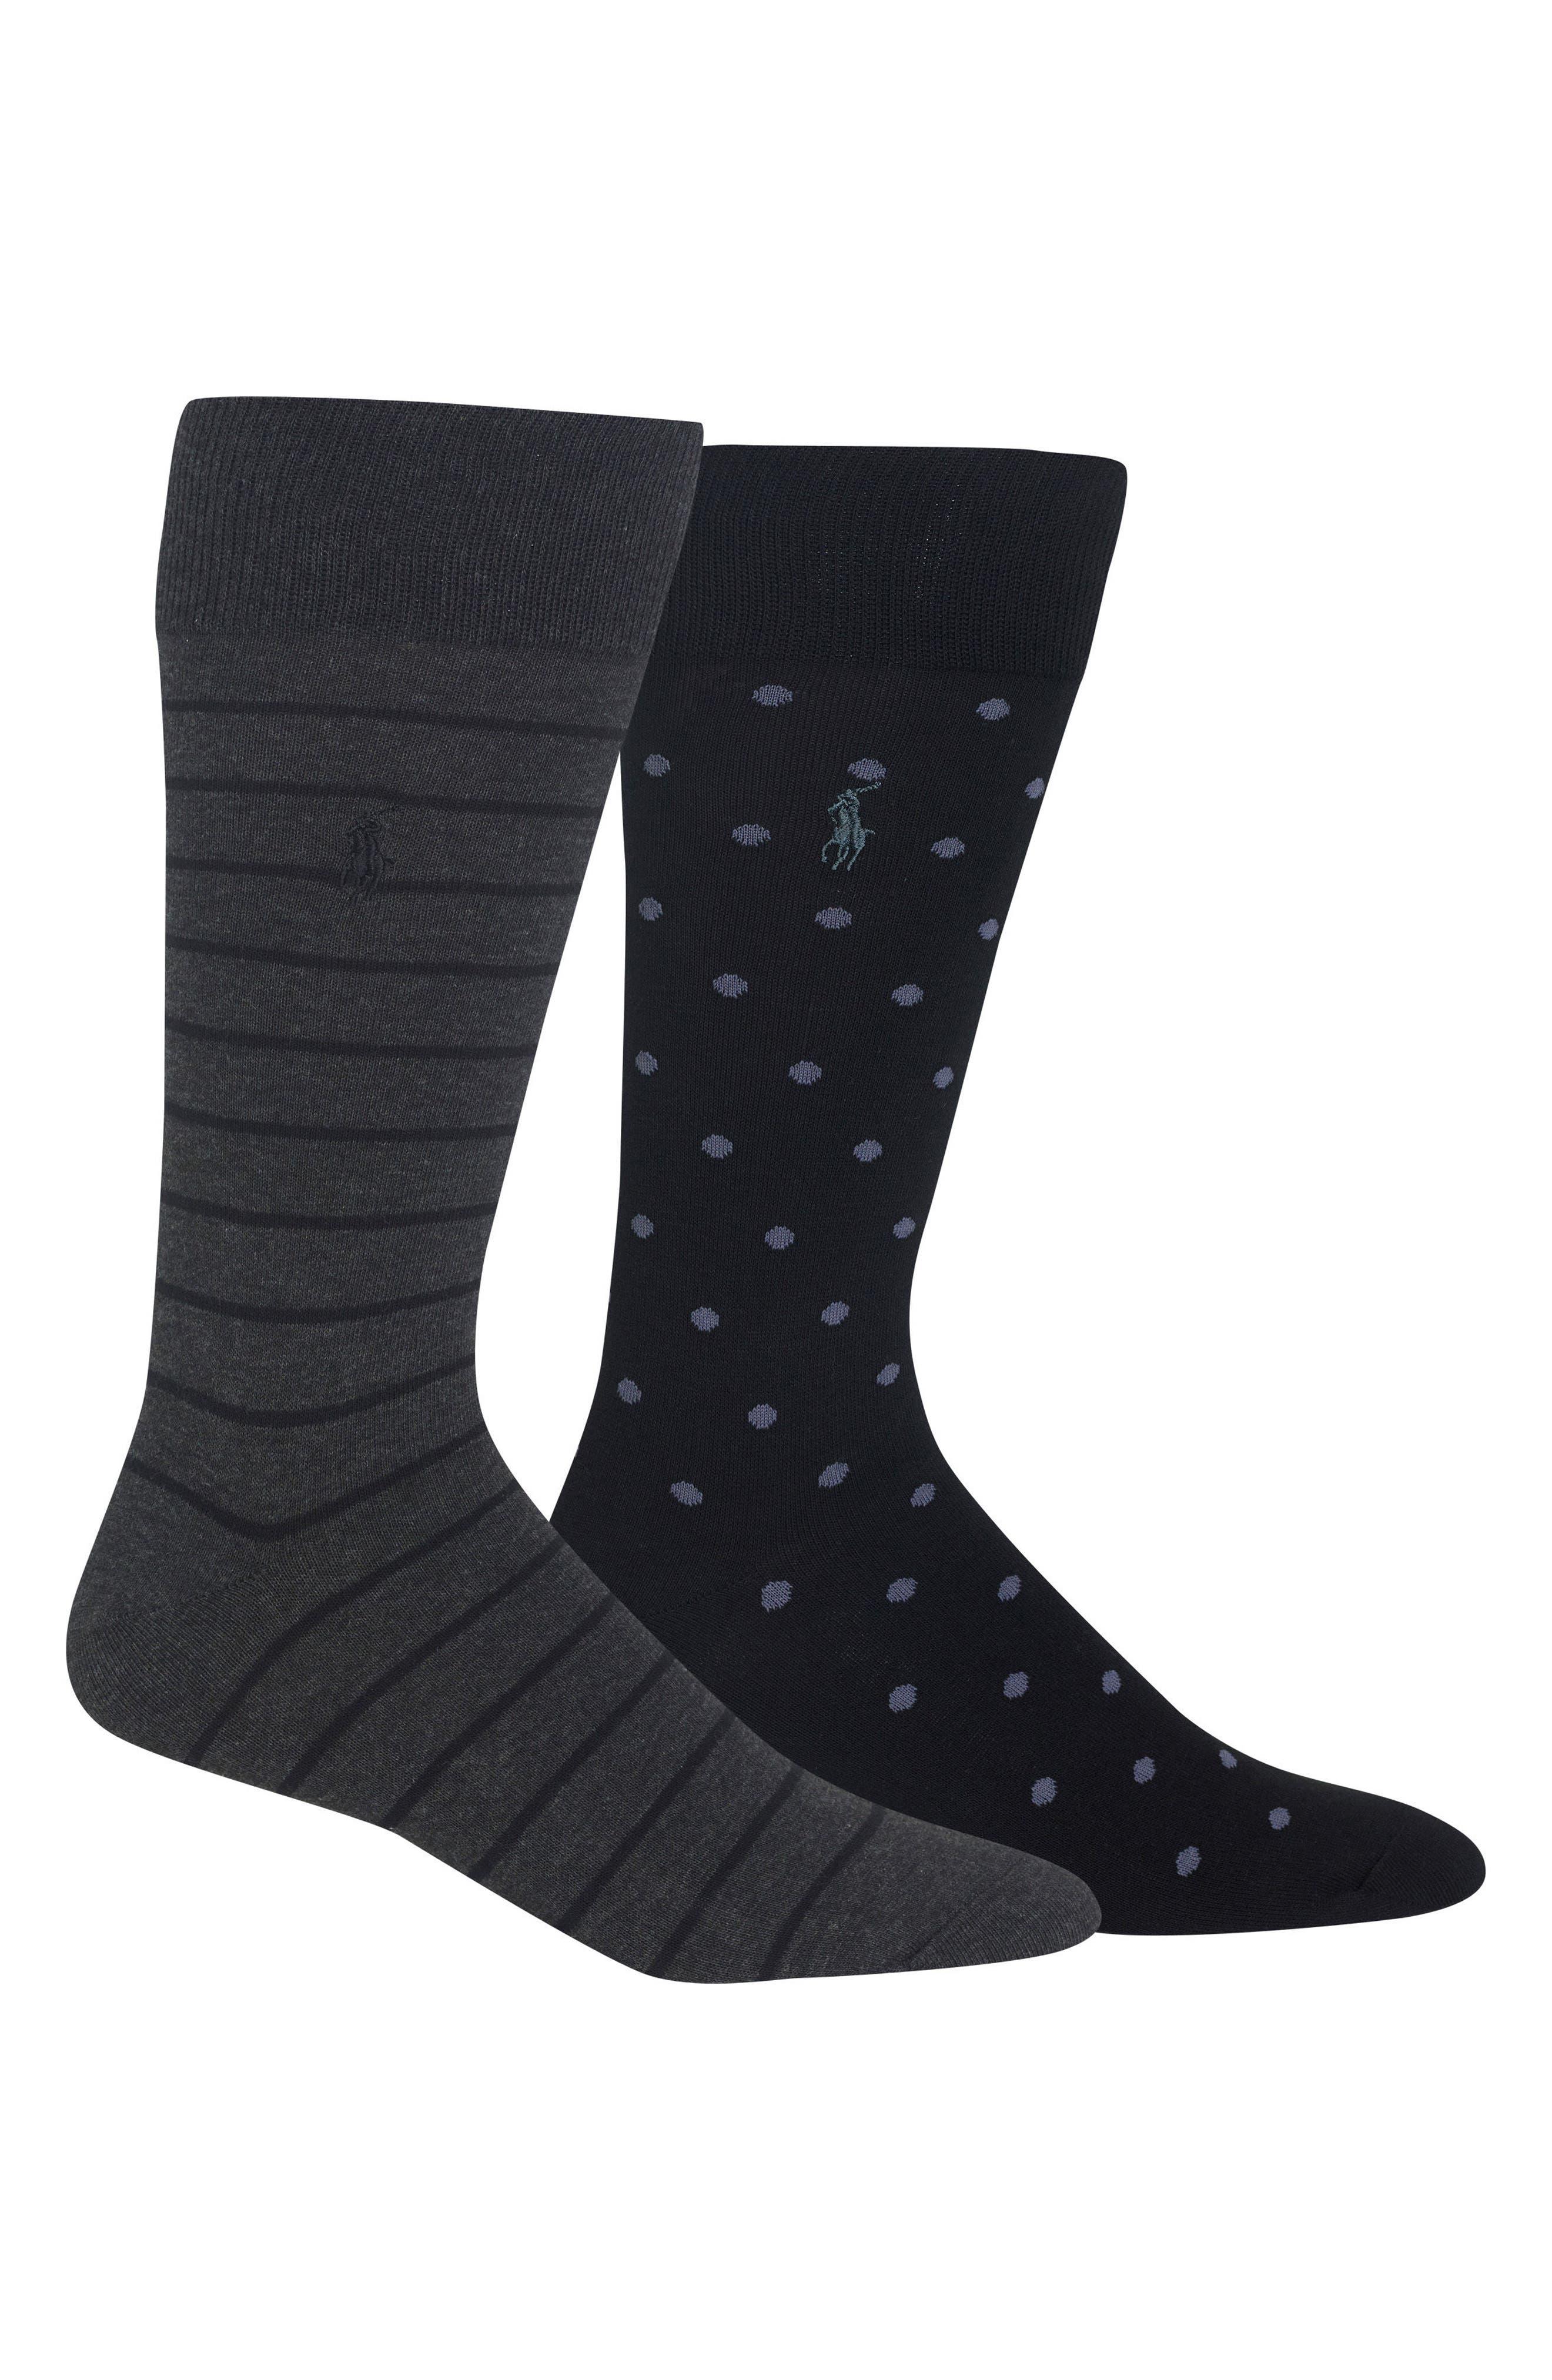 2-Pack Socks,                         Main,                         color, 011